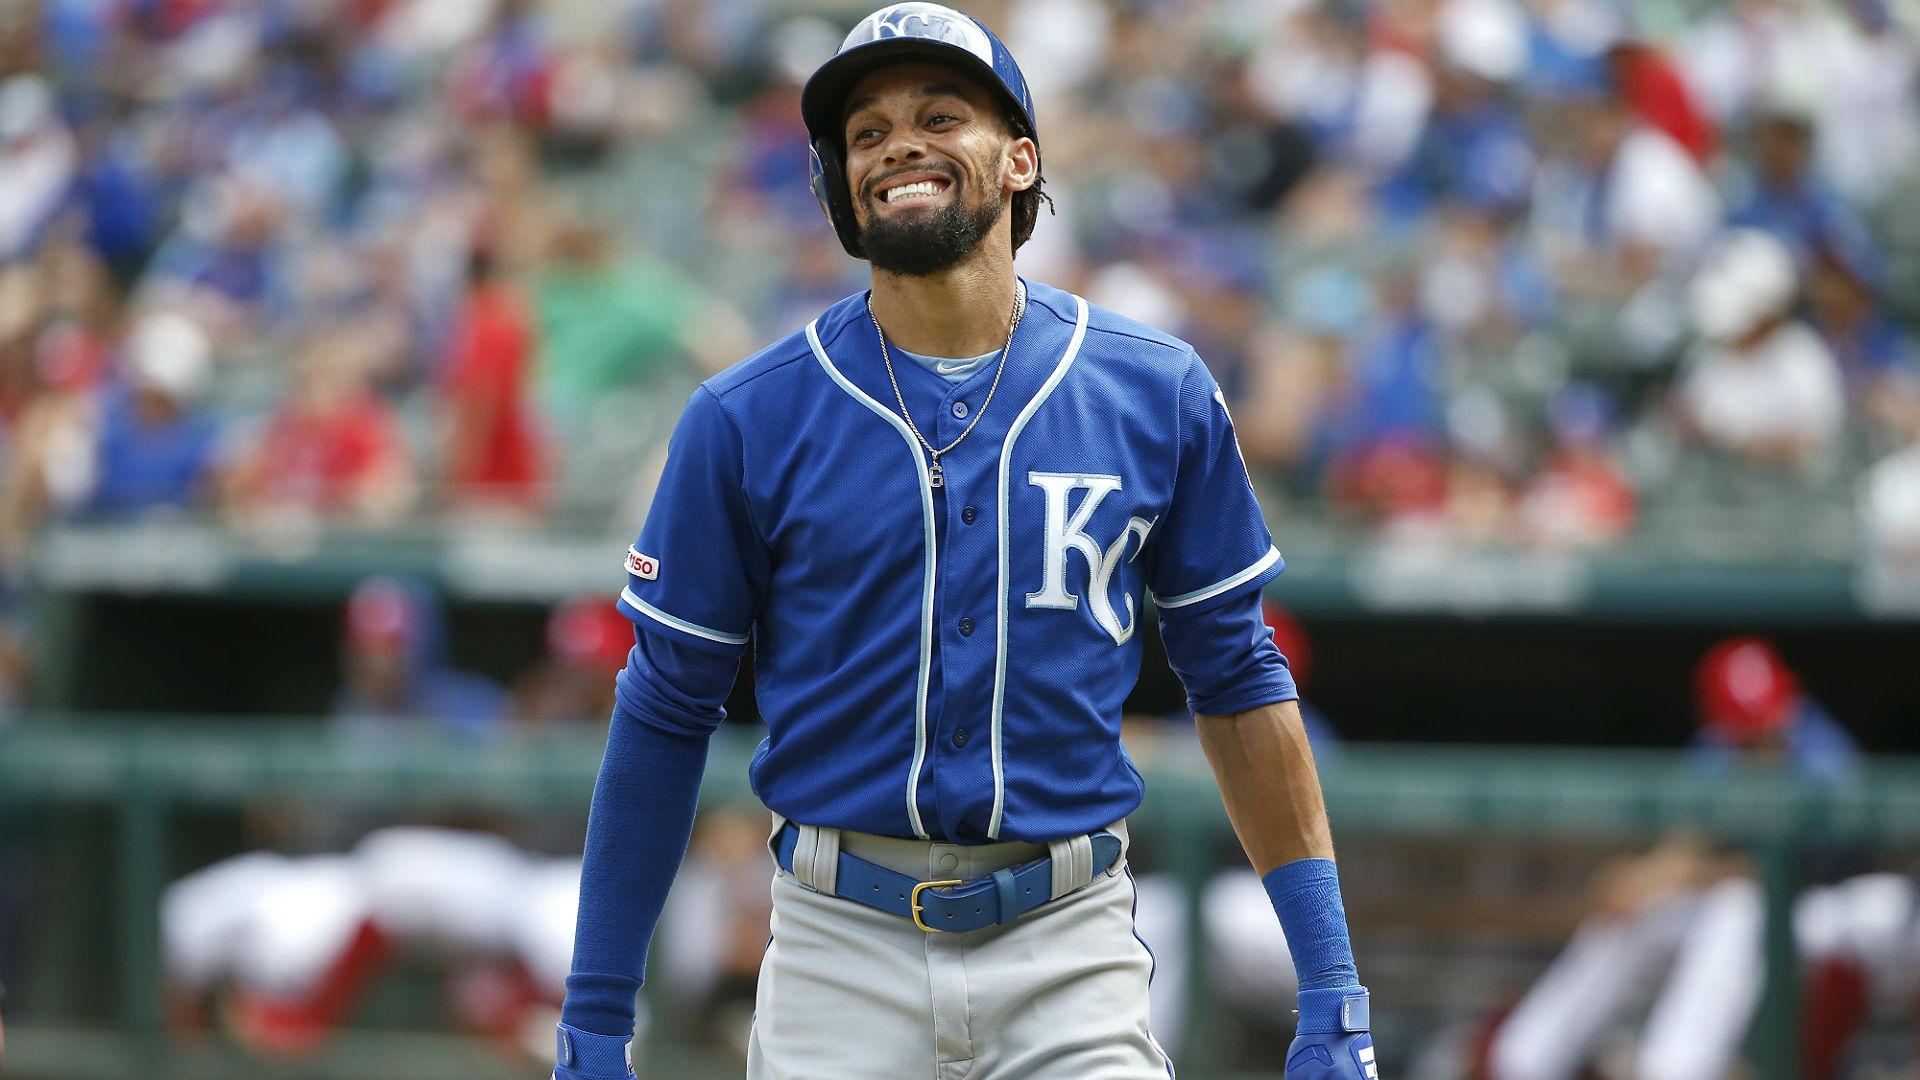 MLB trade rumors: Royals focused on moving Billy Hamilton, Ian Kennedy, other veterans